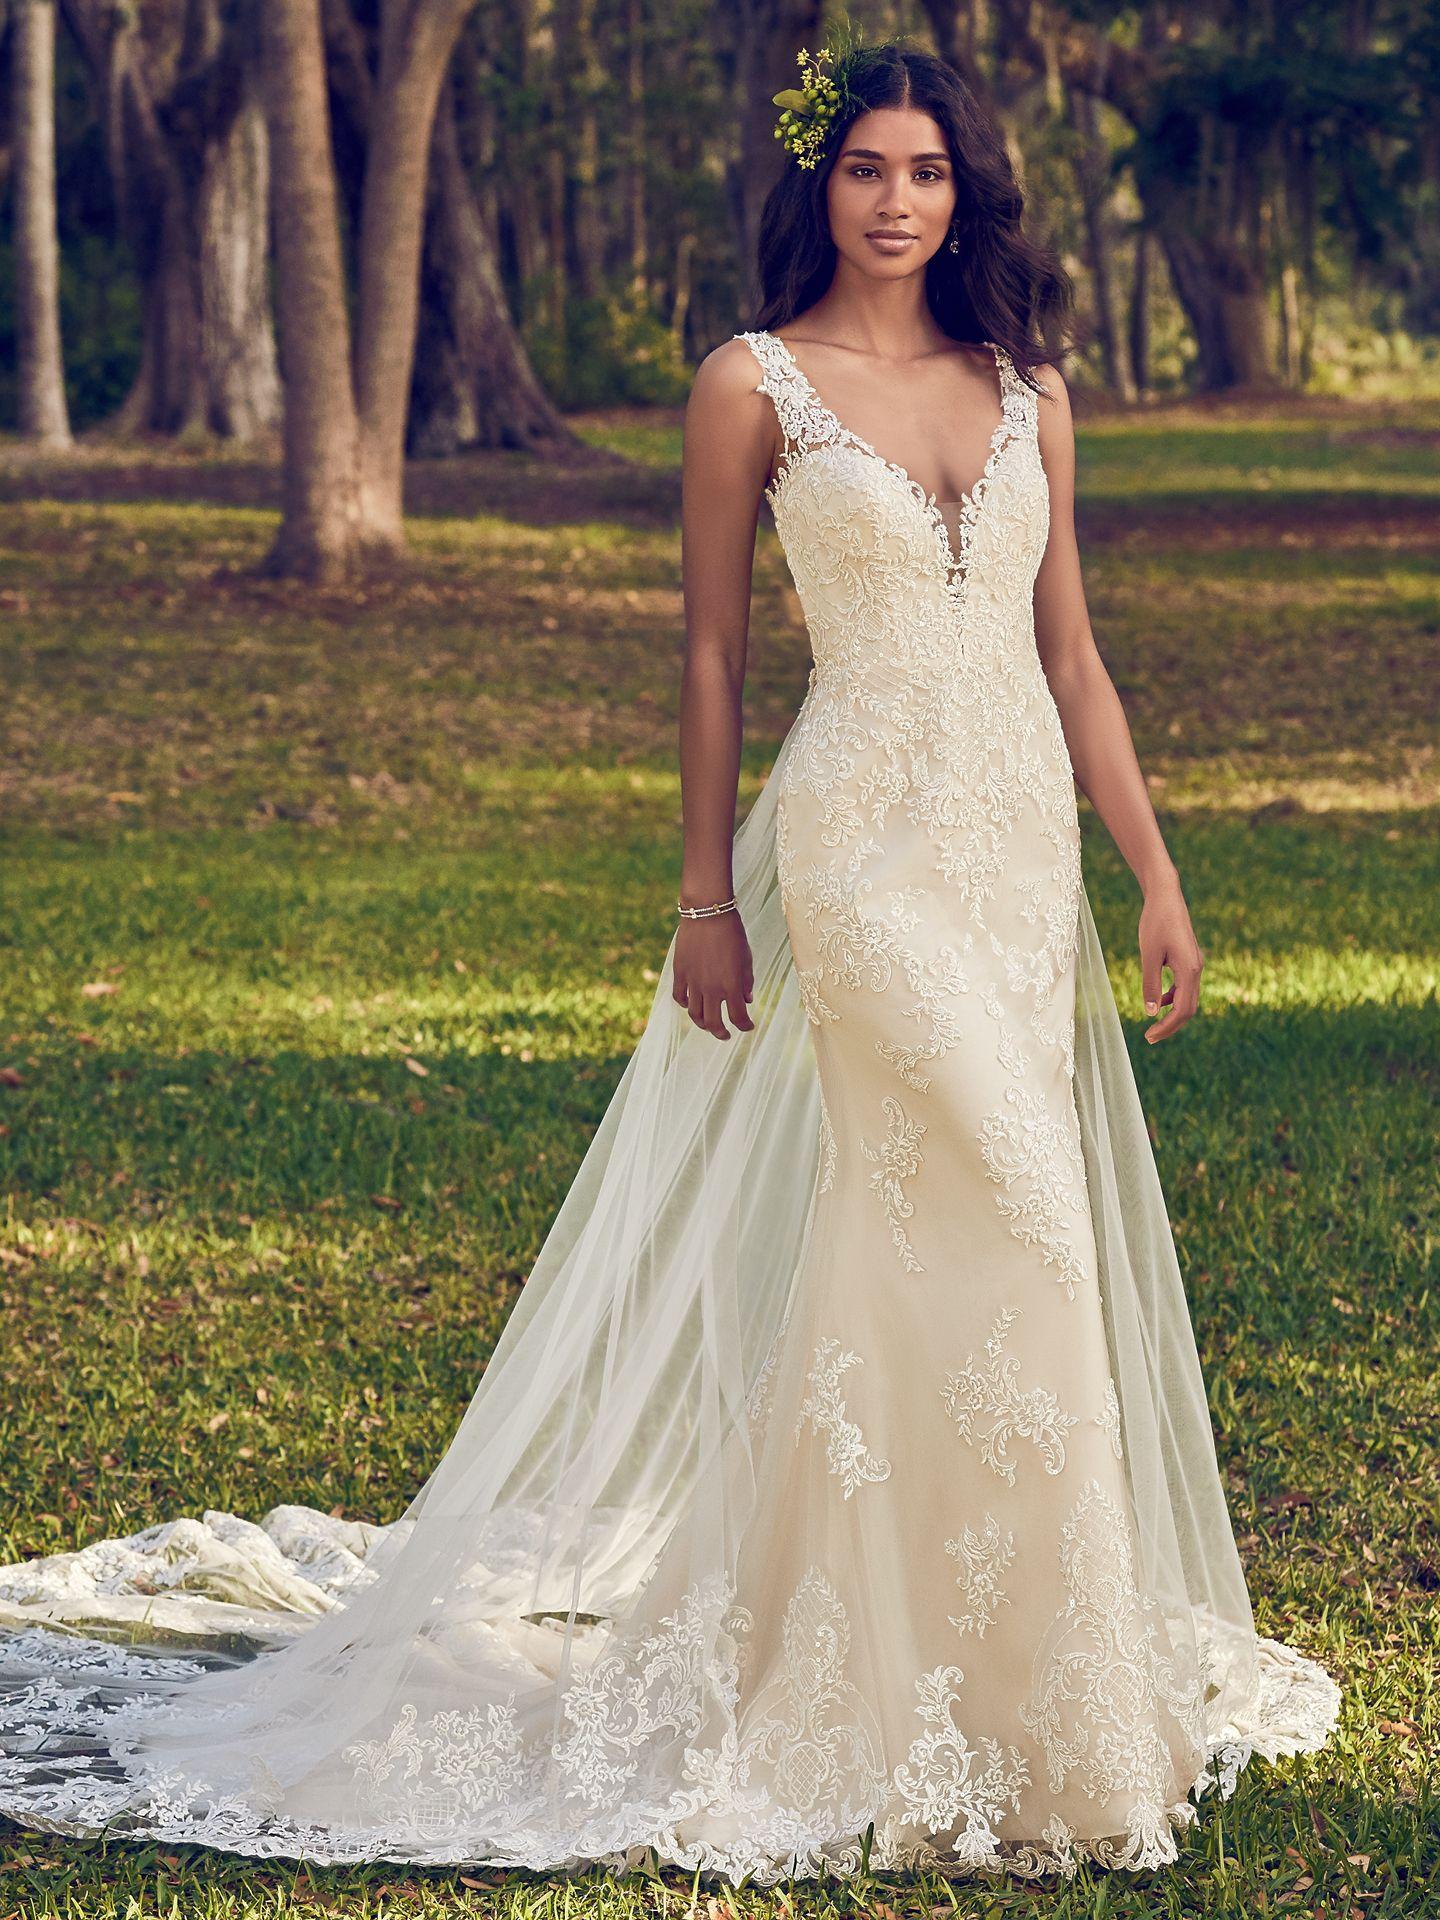 Maggie Sottero Wedding Dress Bernadine 8MN499 Alt1